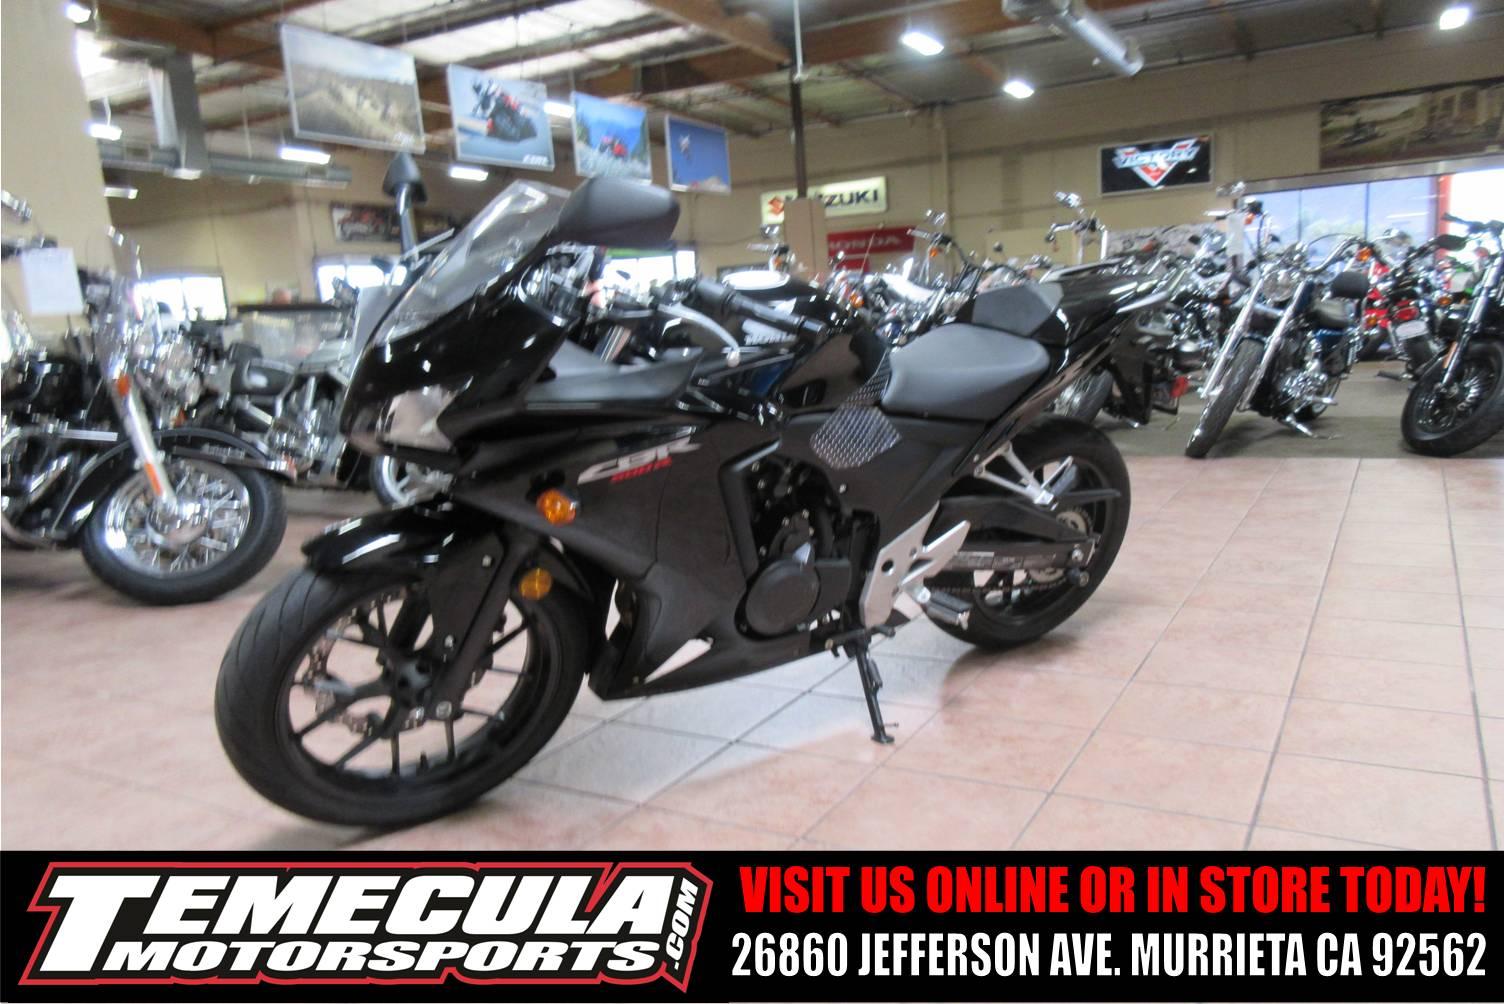 Used 2014 Honda CBR®500R Motorcycles in Murrieta, CA | Stock Number ...